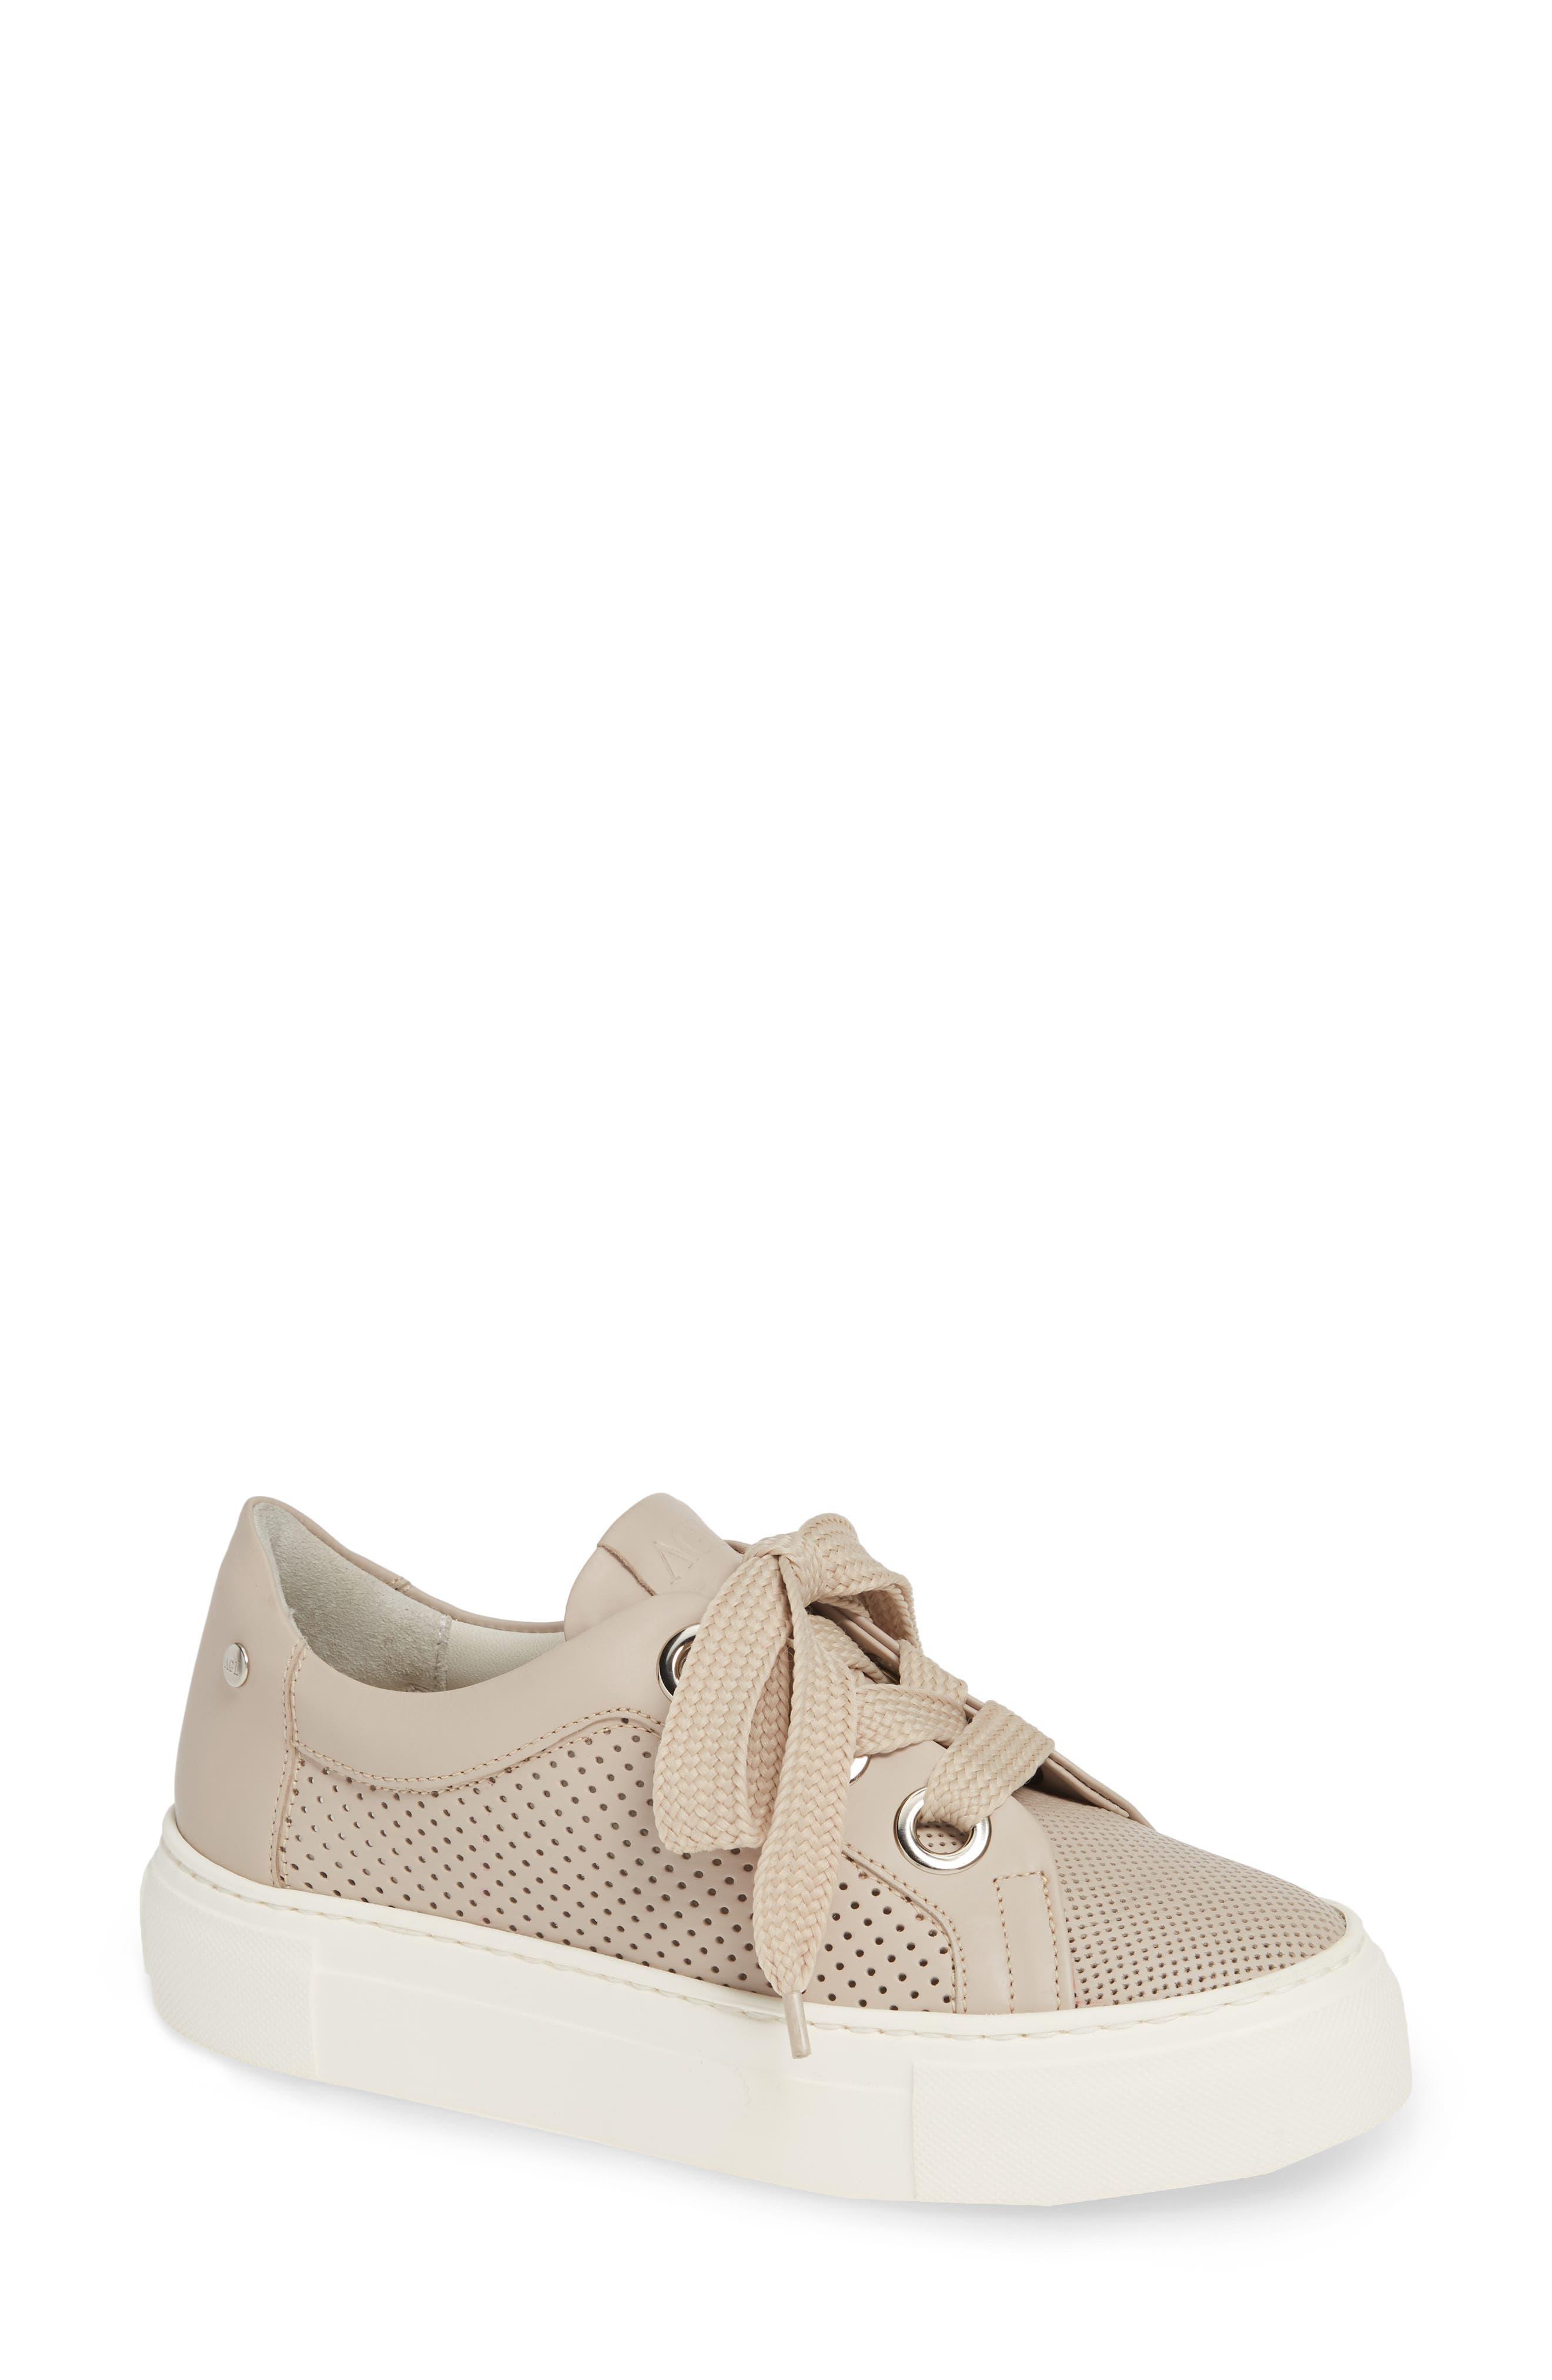 Agl Perforated Platform Sneaker - Beige